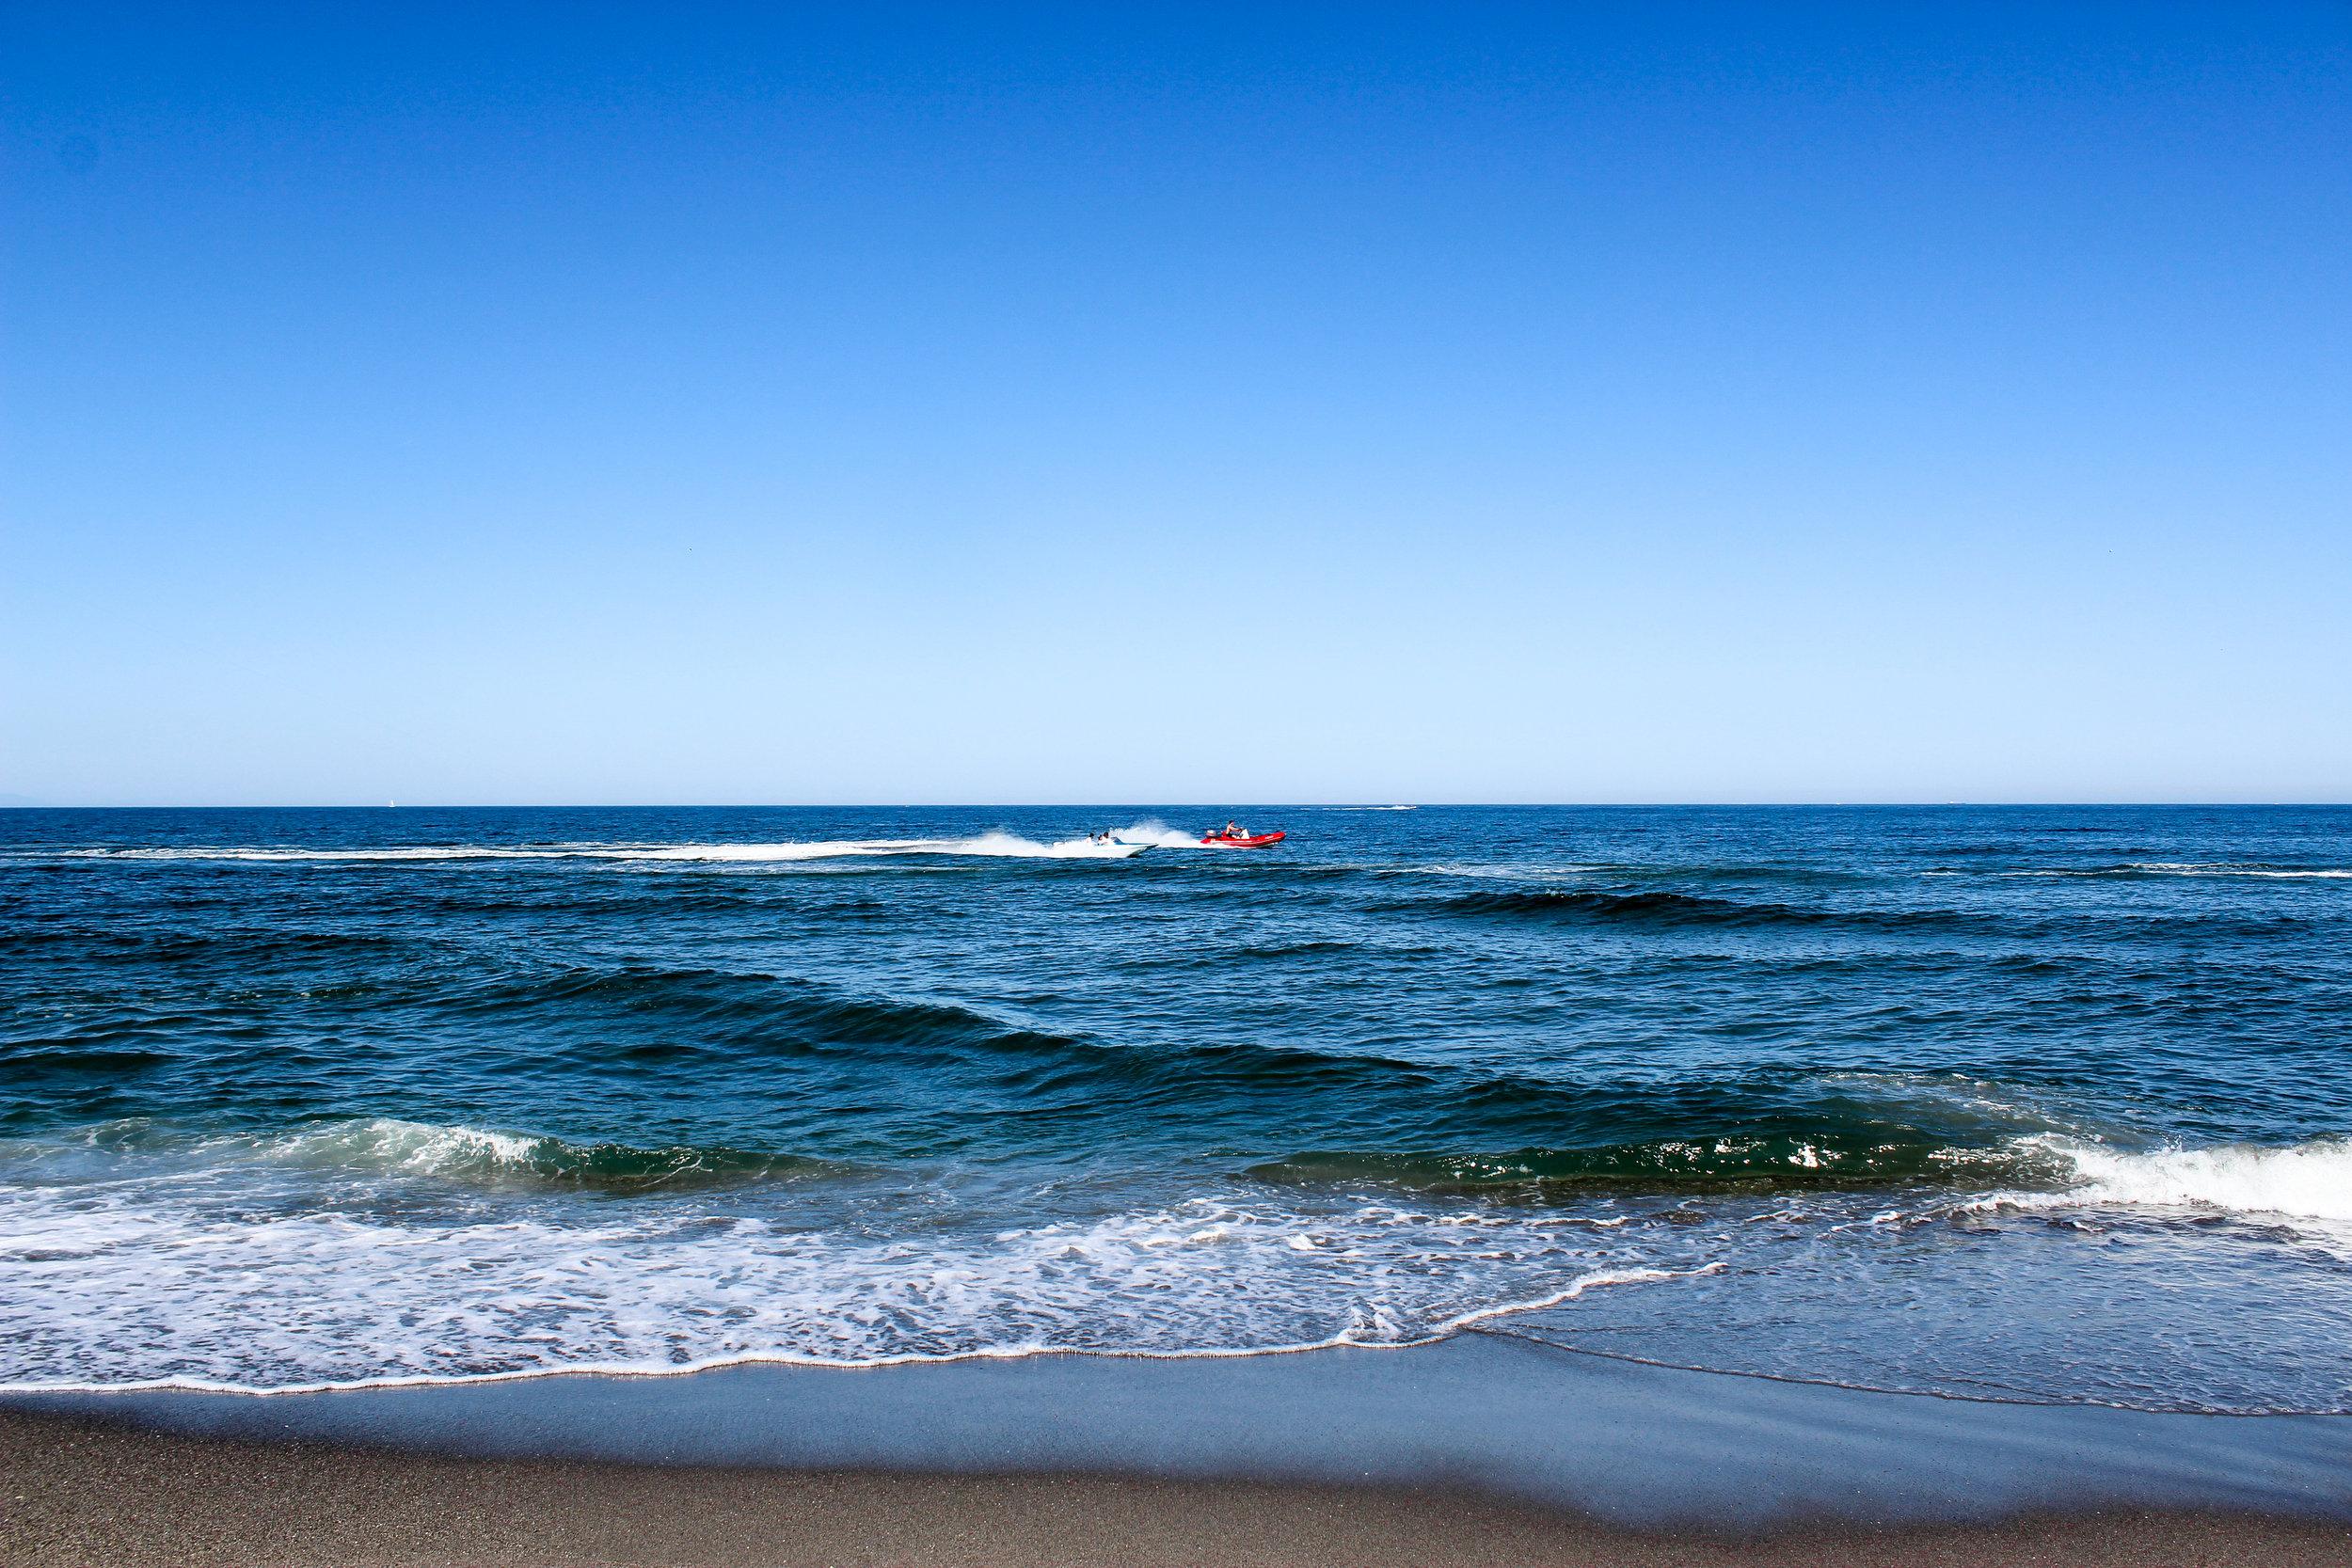 Playa de Levante, La Linea de la Concepcion, Mediterranean Sea, Cádiz, Andalusia, Spain, Europe | www.DoLessGetMoreDone.com |